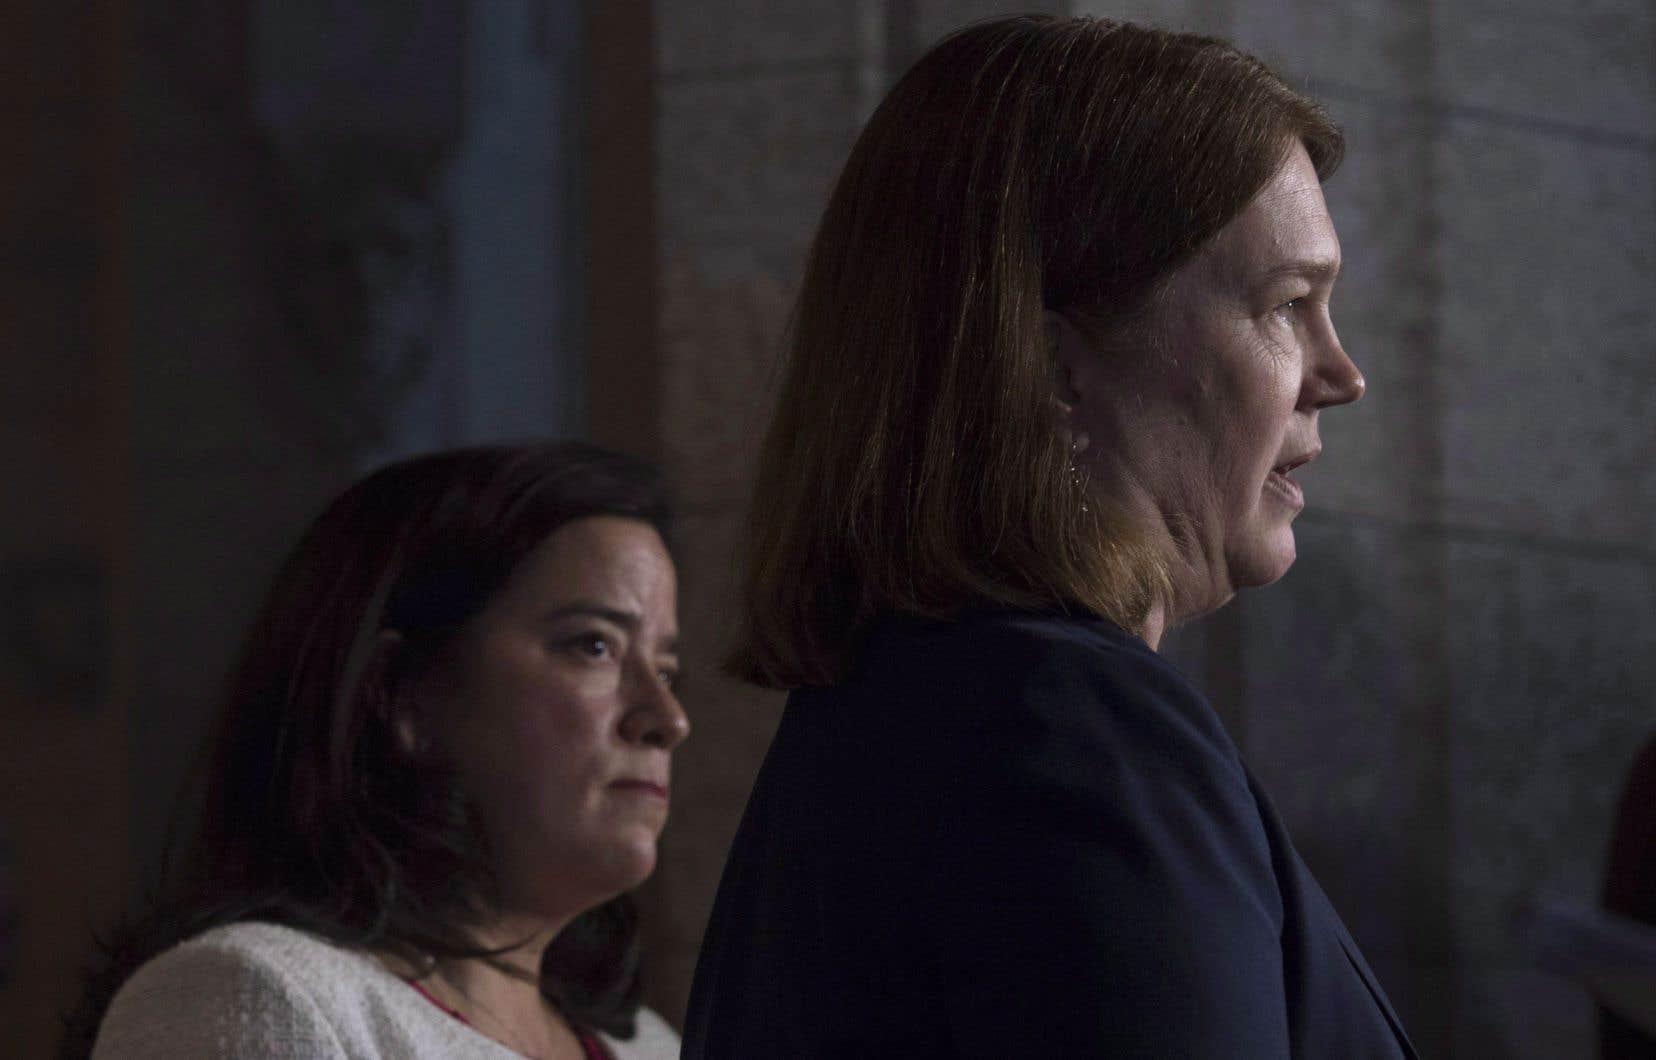 Les ex-ministres Jody Wilson-Raybould et Jane Philpott